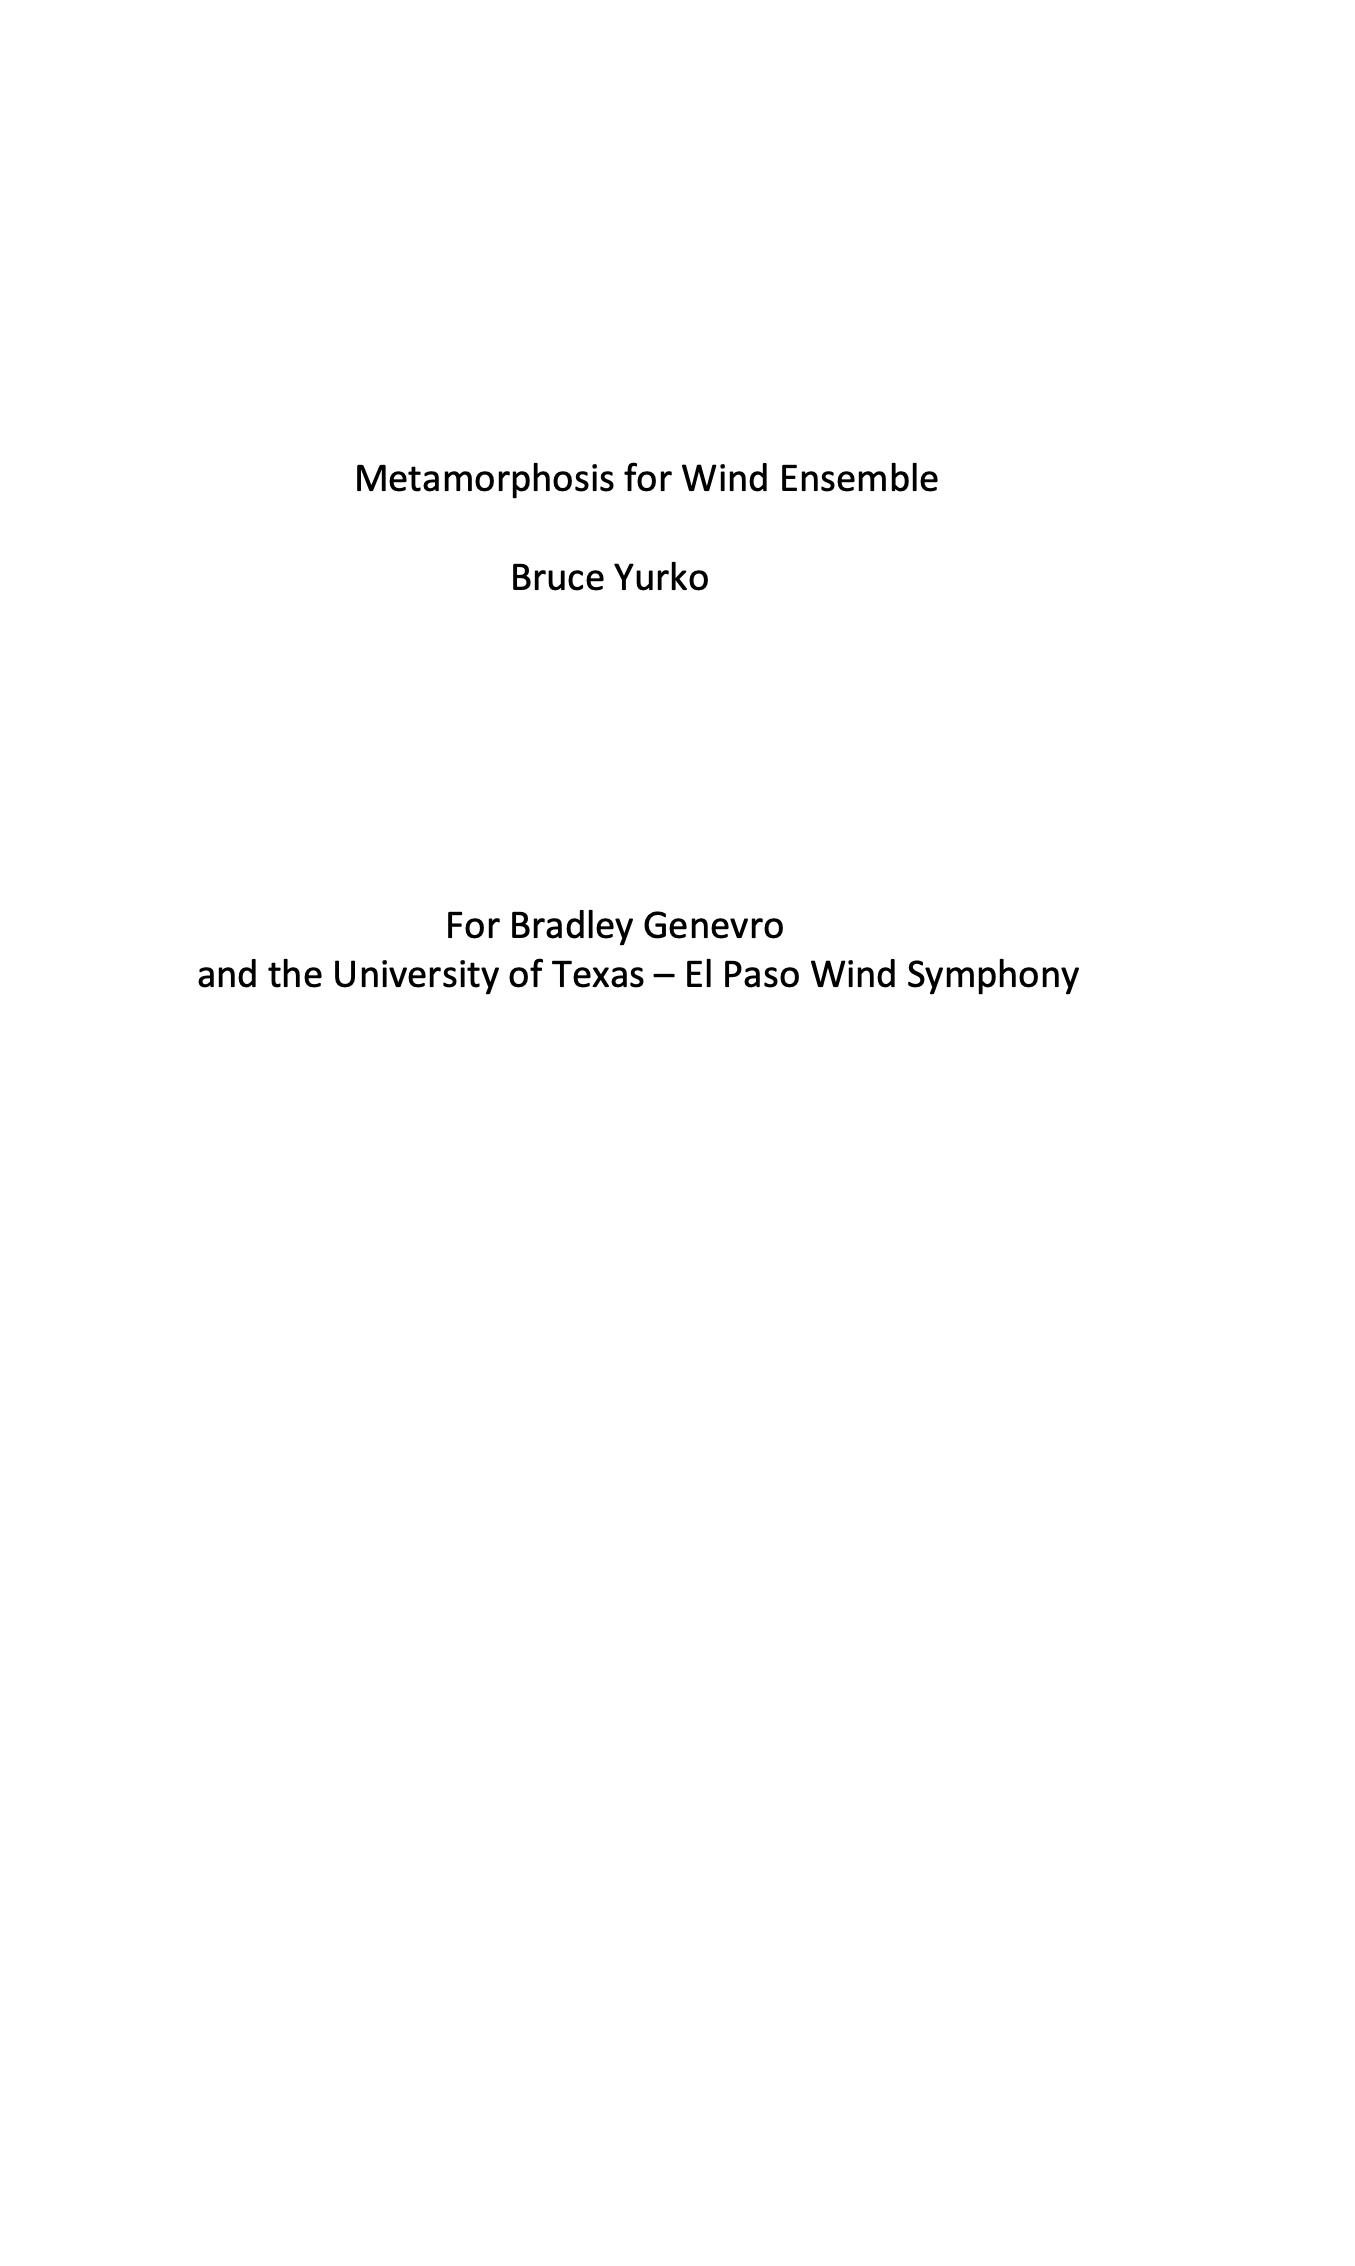 Metamorphosis For Wind Ensemble by Bruce Yurko